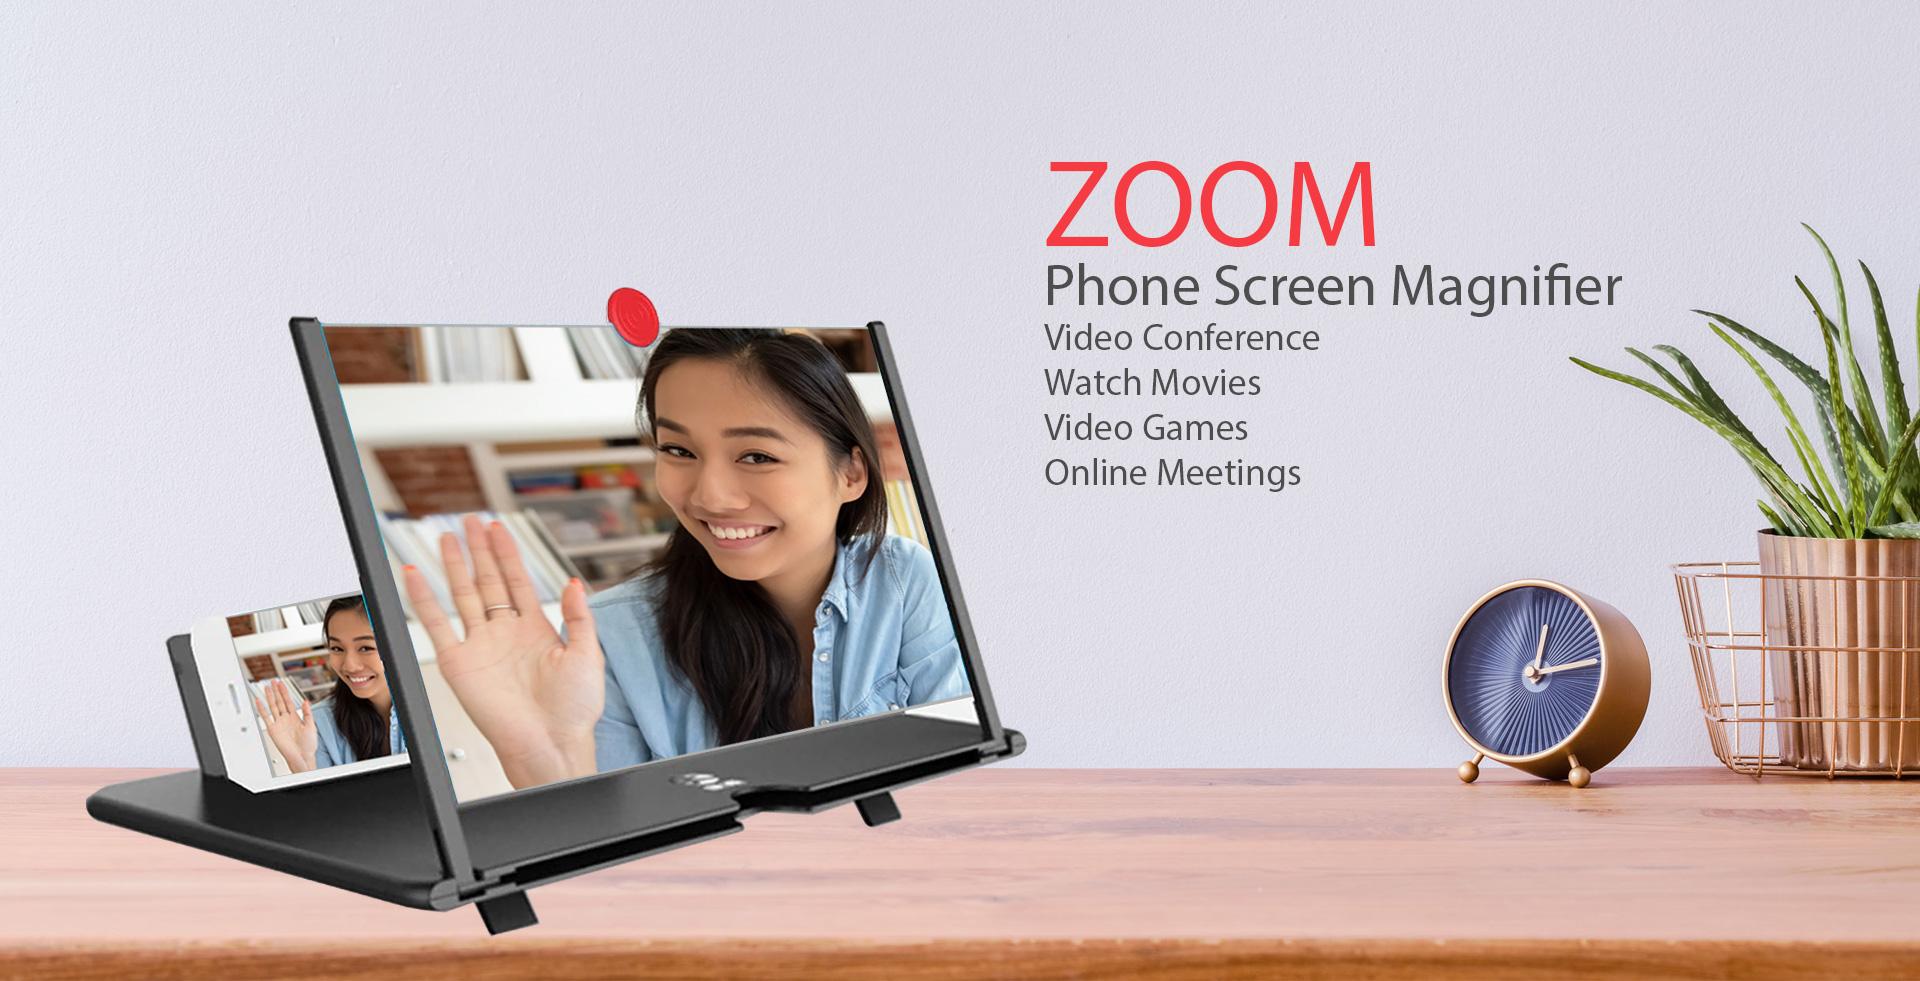 Zoom Phone Screen Magnifier